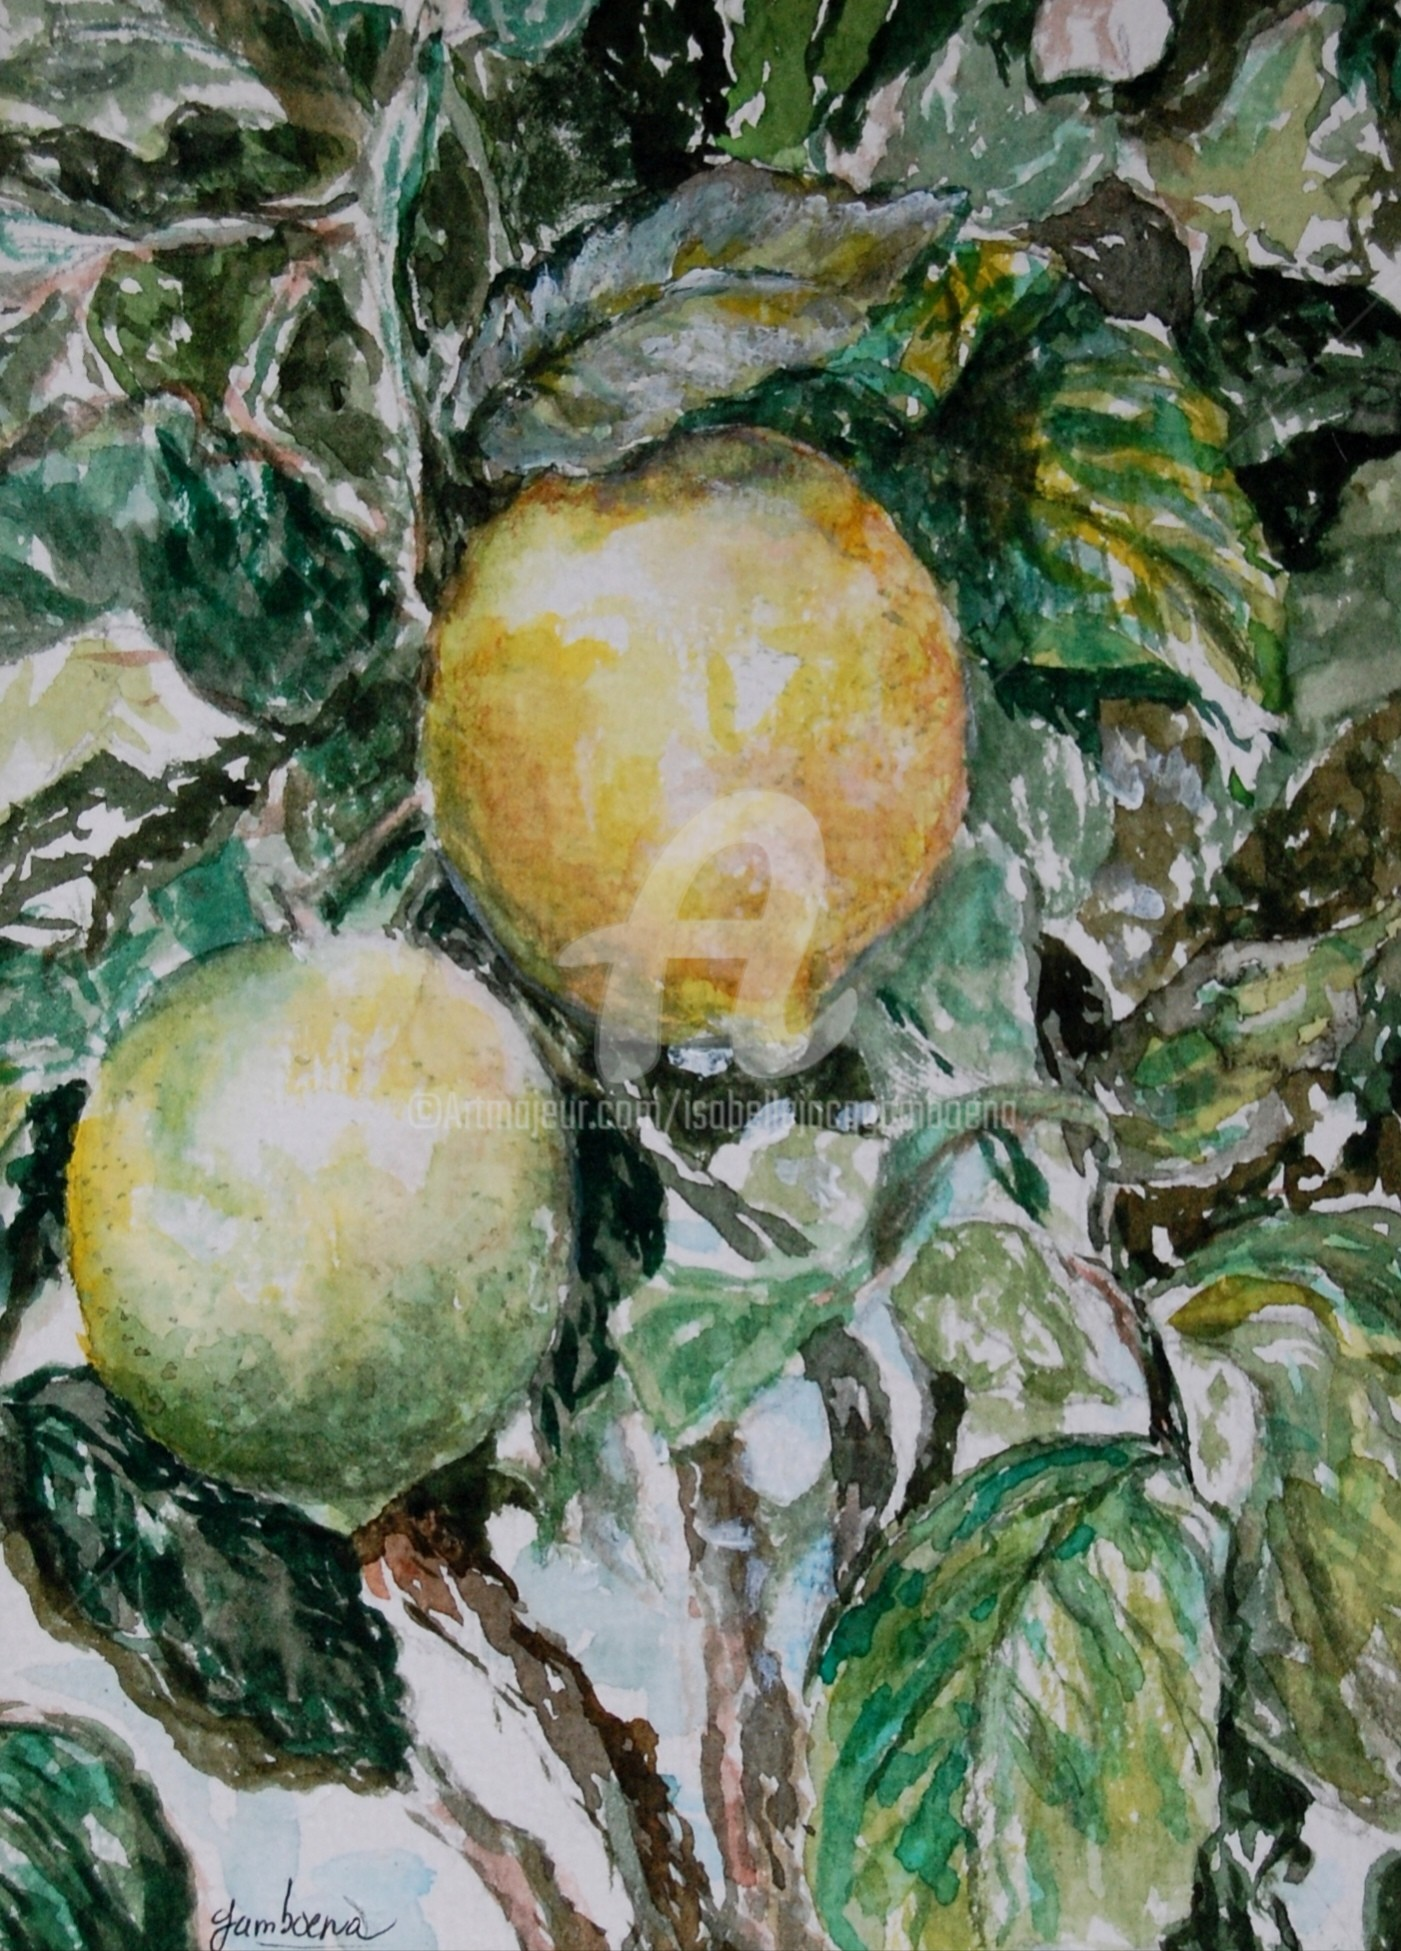 Isabelle Jacq Gamboena - Limones